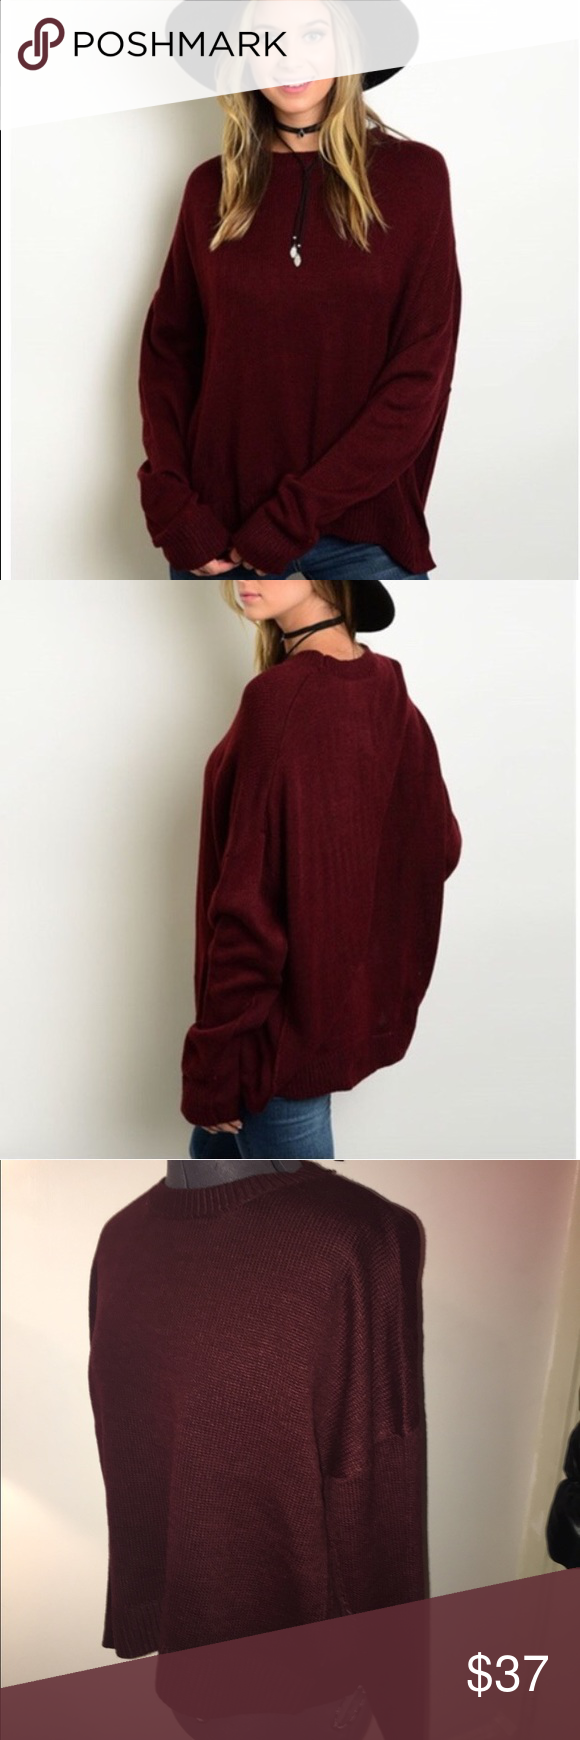 NWT Burgundy Oversized Boyfriend Sweater Boutique | Burgundy color ...